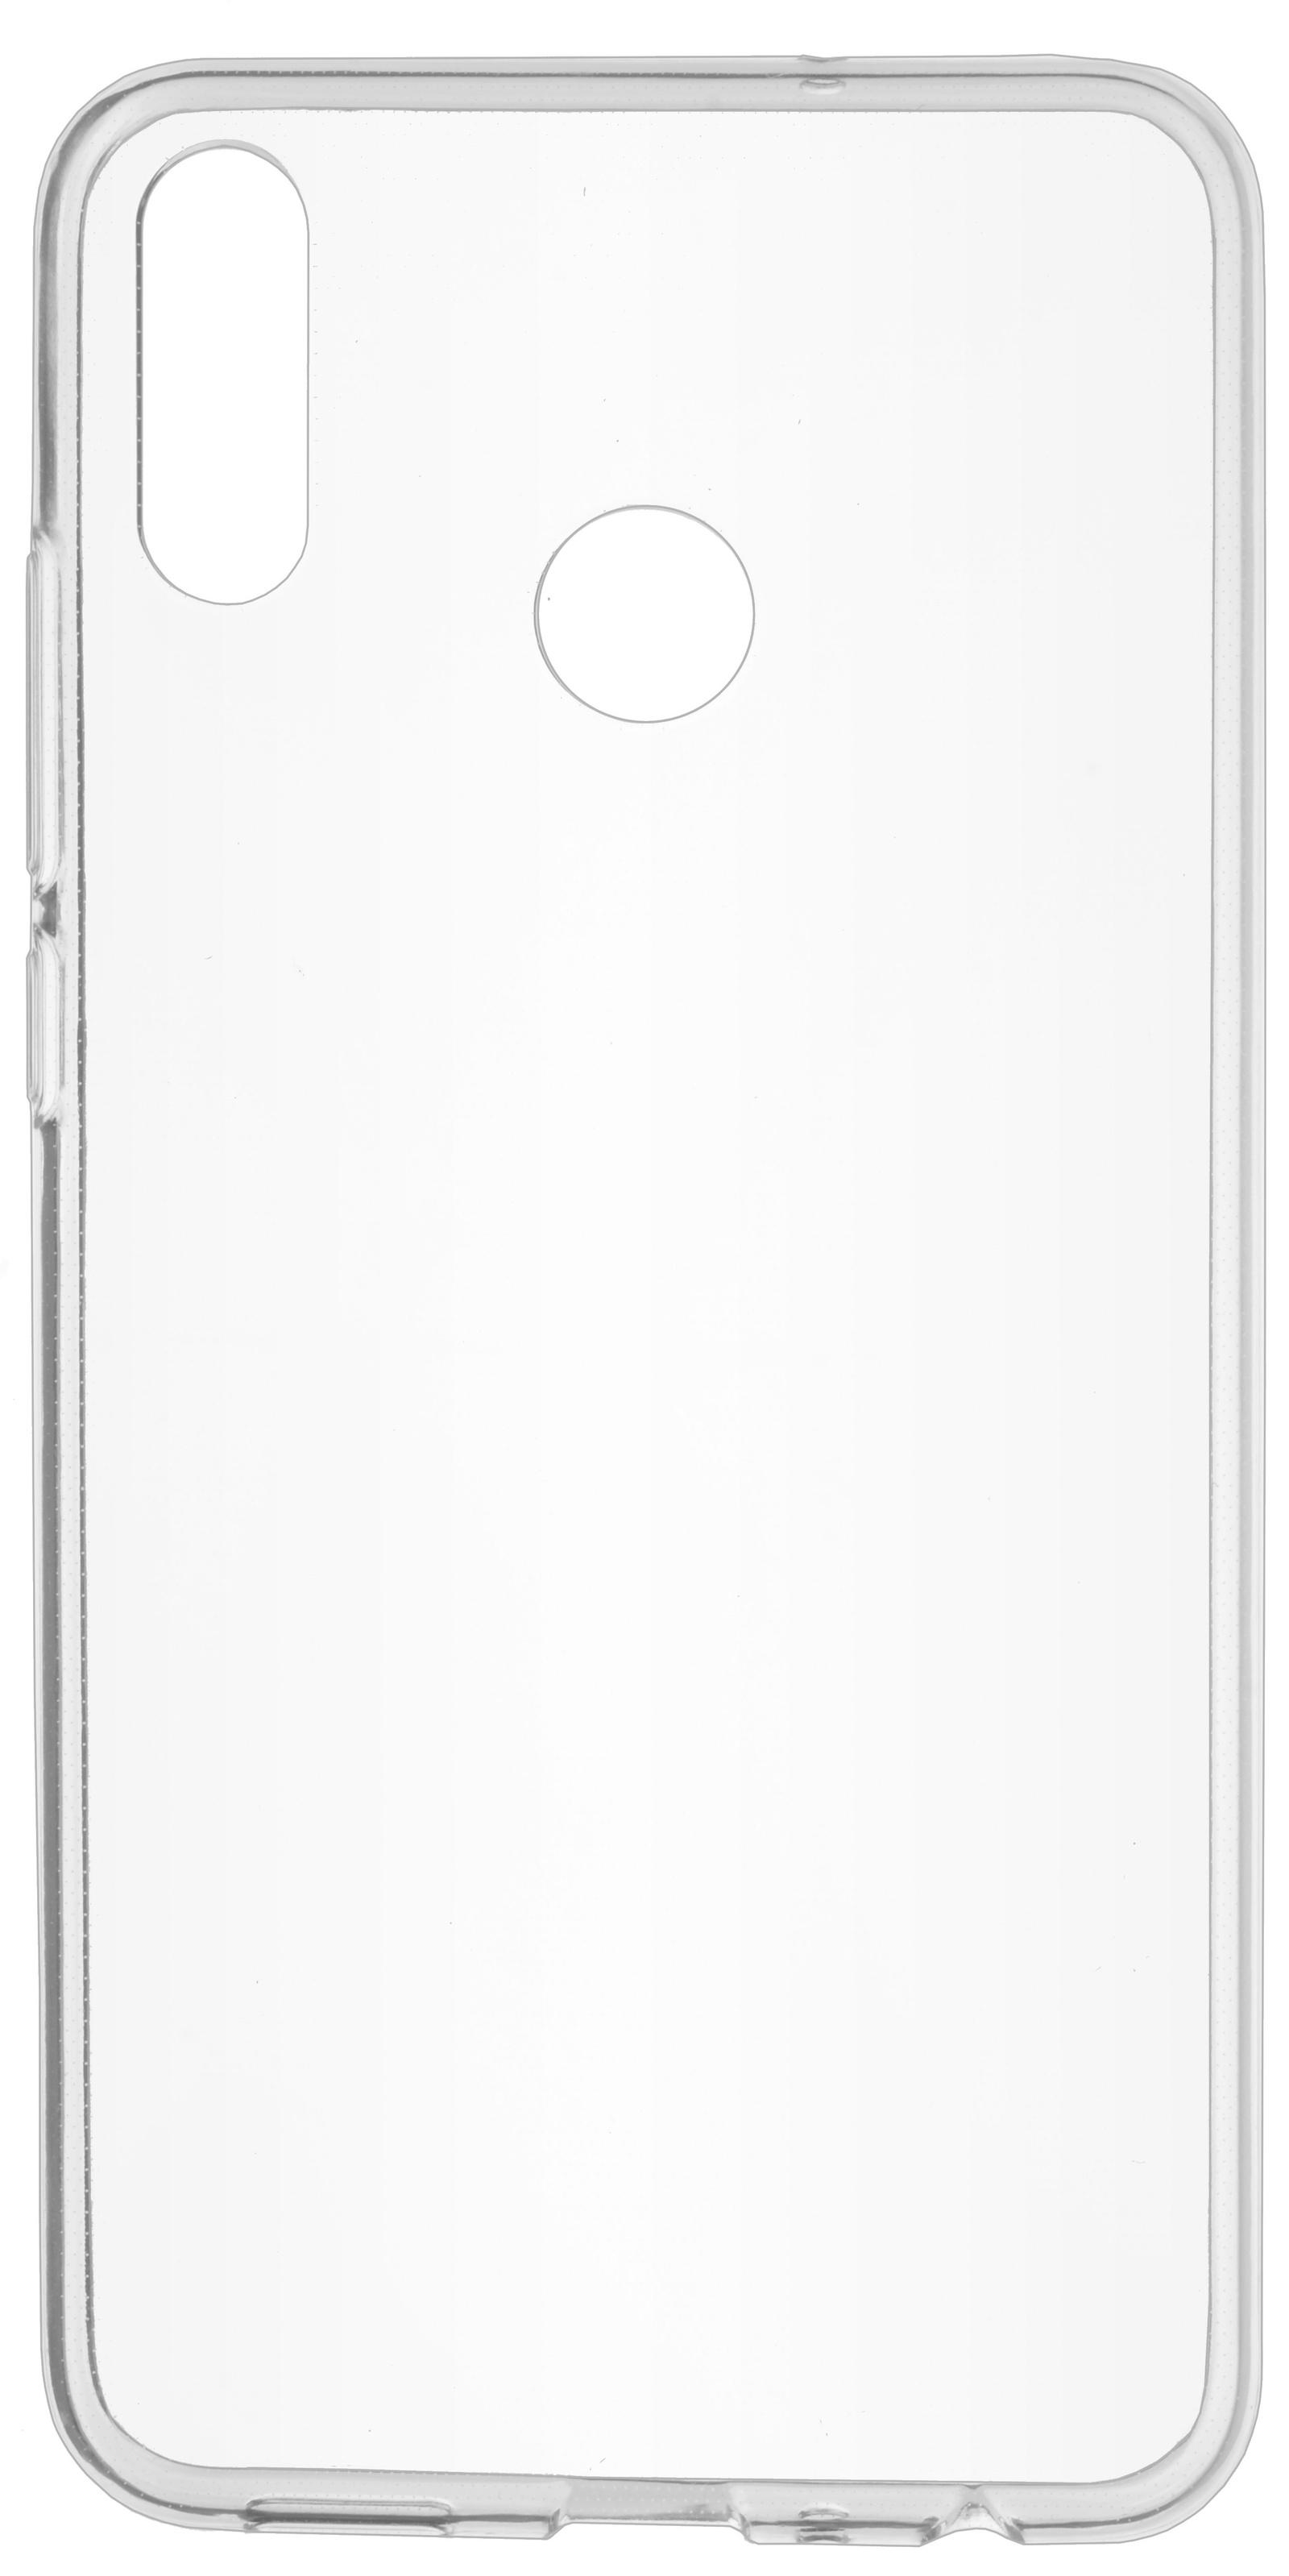 Накладка Skinbox Slim Silicone для Honor 8X, 4630042520622, прозрачный skinbox накладка skinbox slim silicone для lg v20